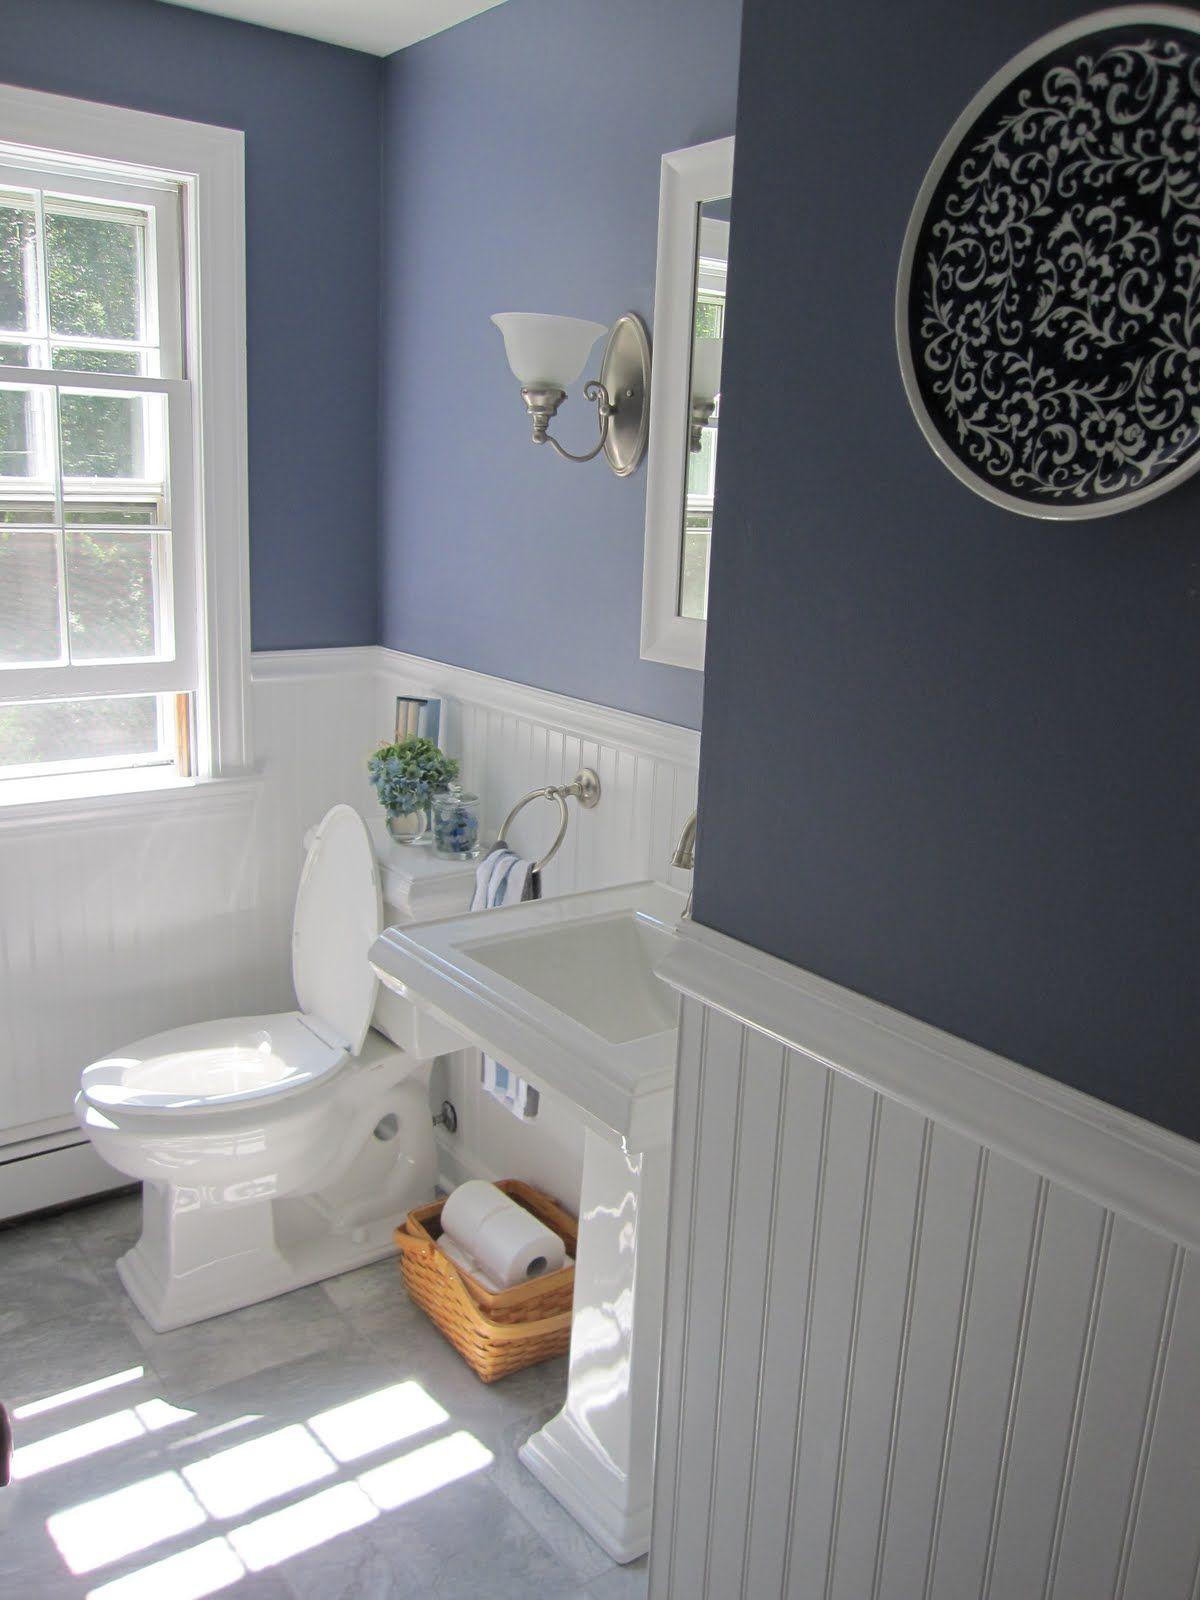 25 stylish wainscoting ideas bathroom colorsbathroom ideasblue